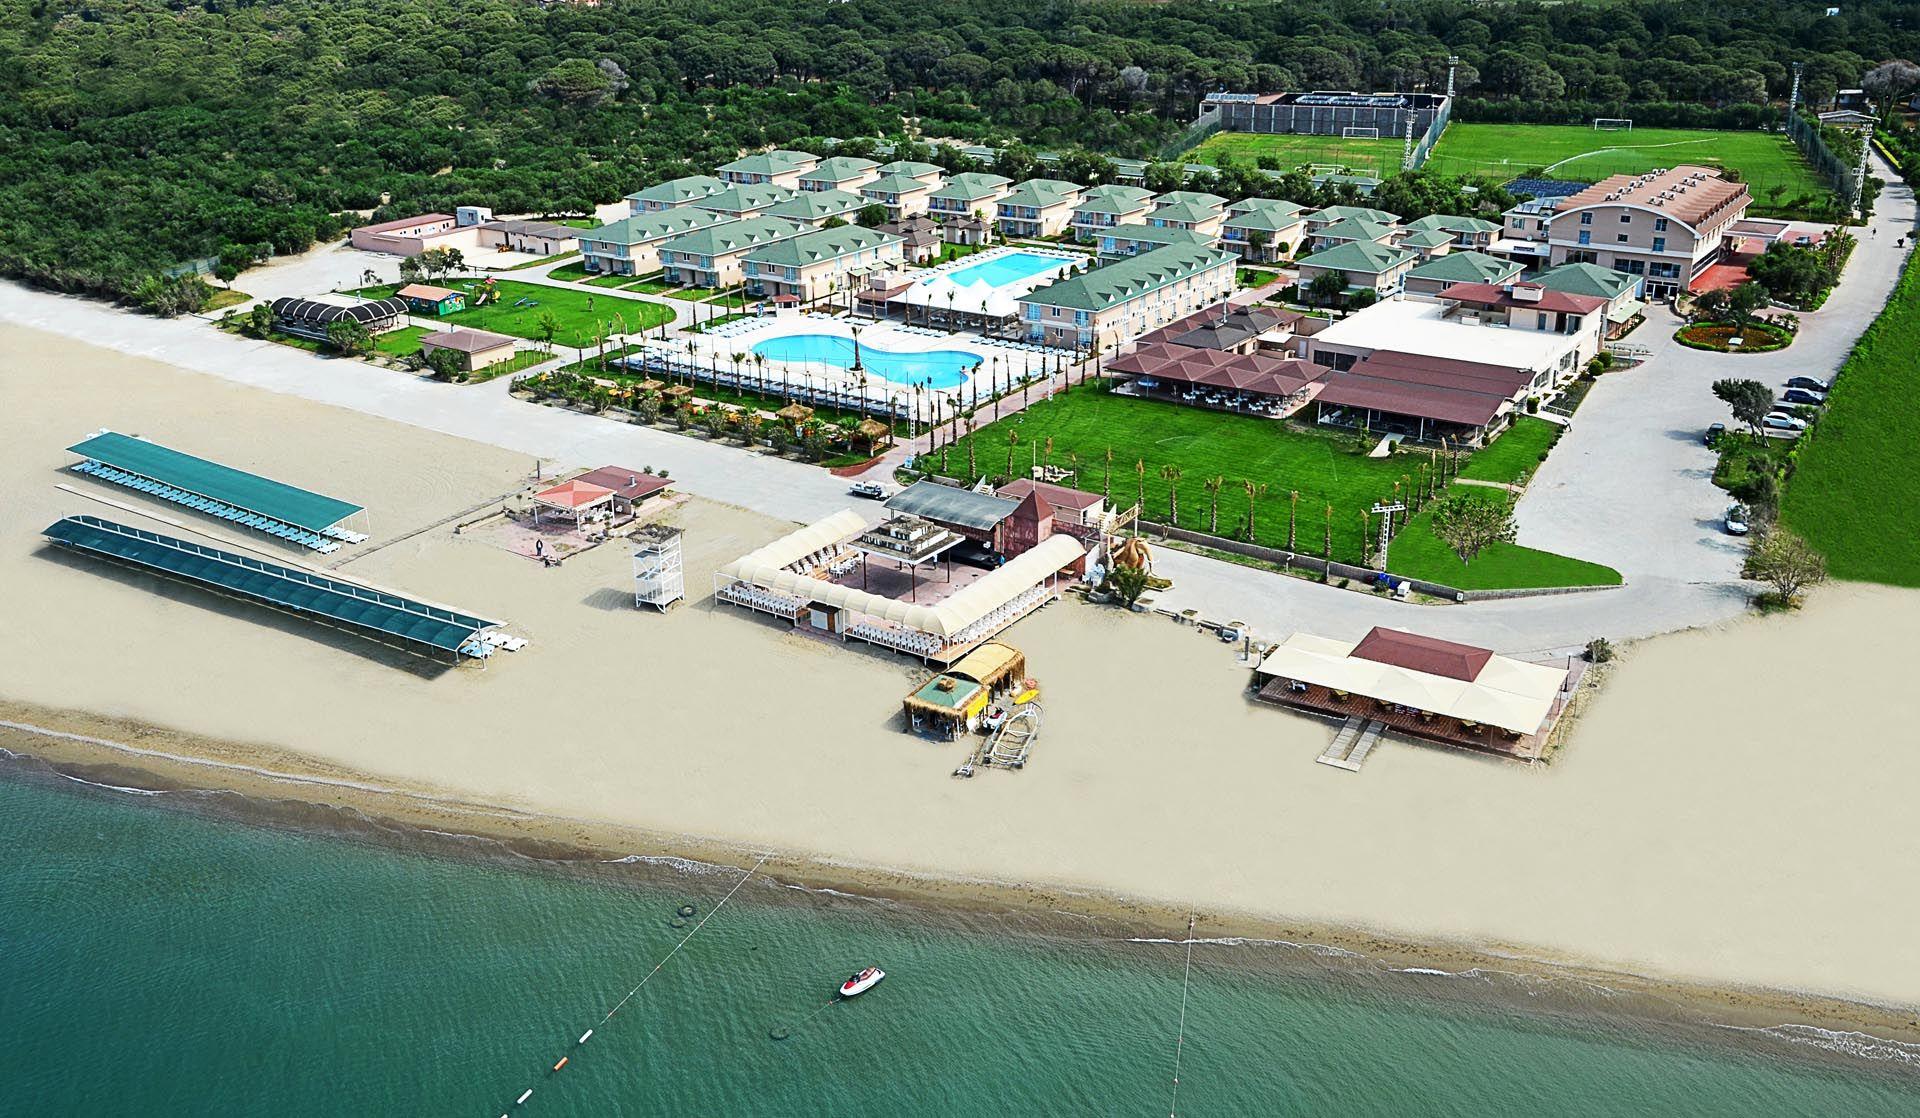 Armas Hotels Adli Kullanicinin General View Panosundaki Pin Oteller Tatil Yerleri Havuz